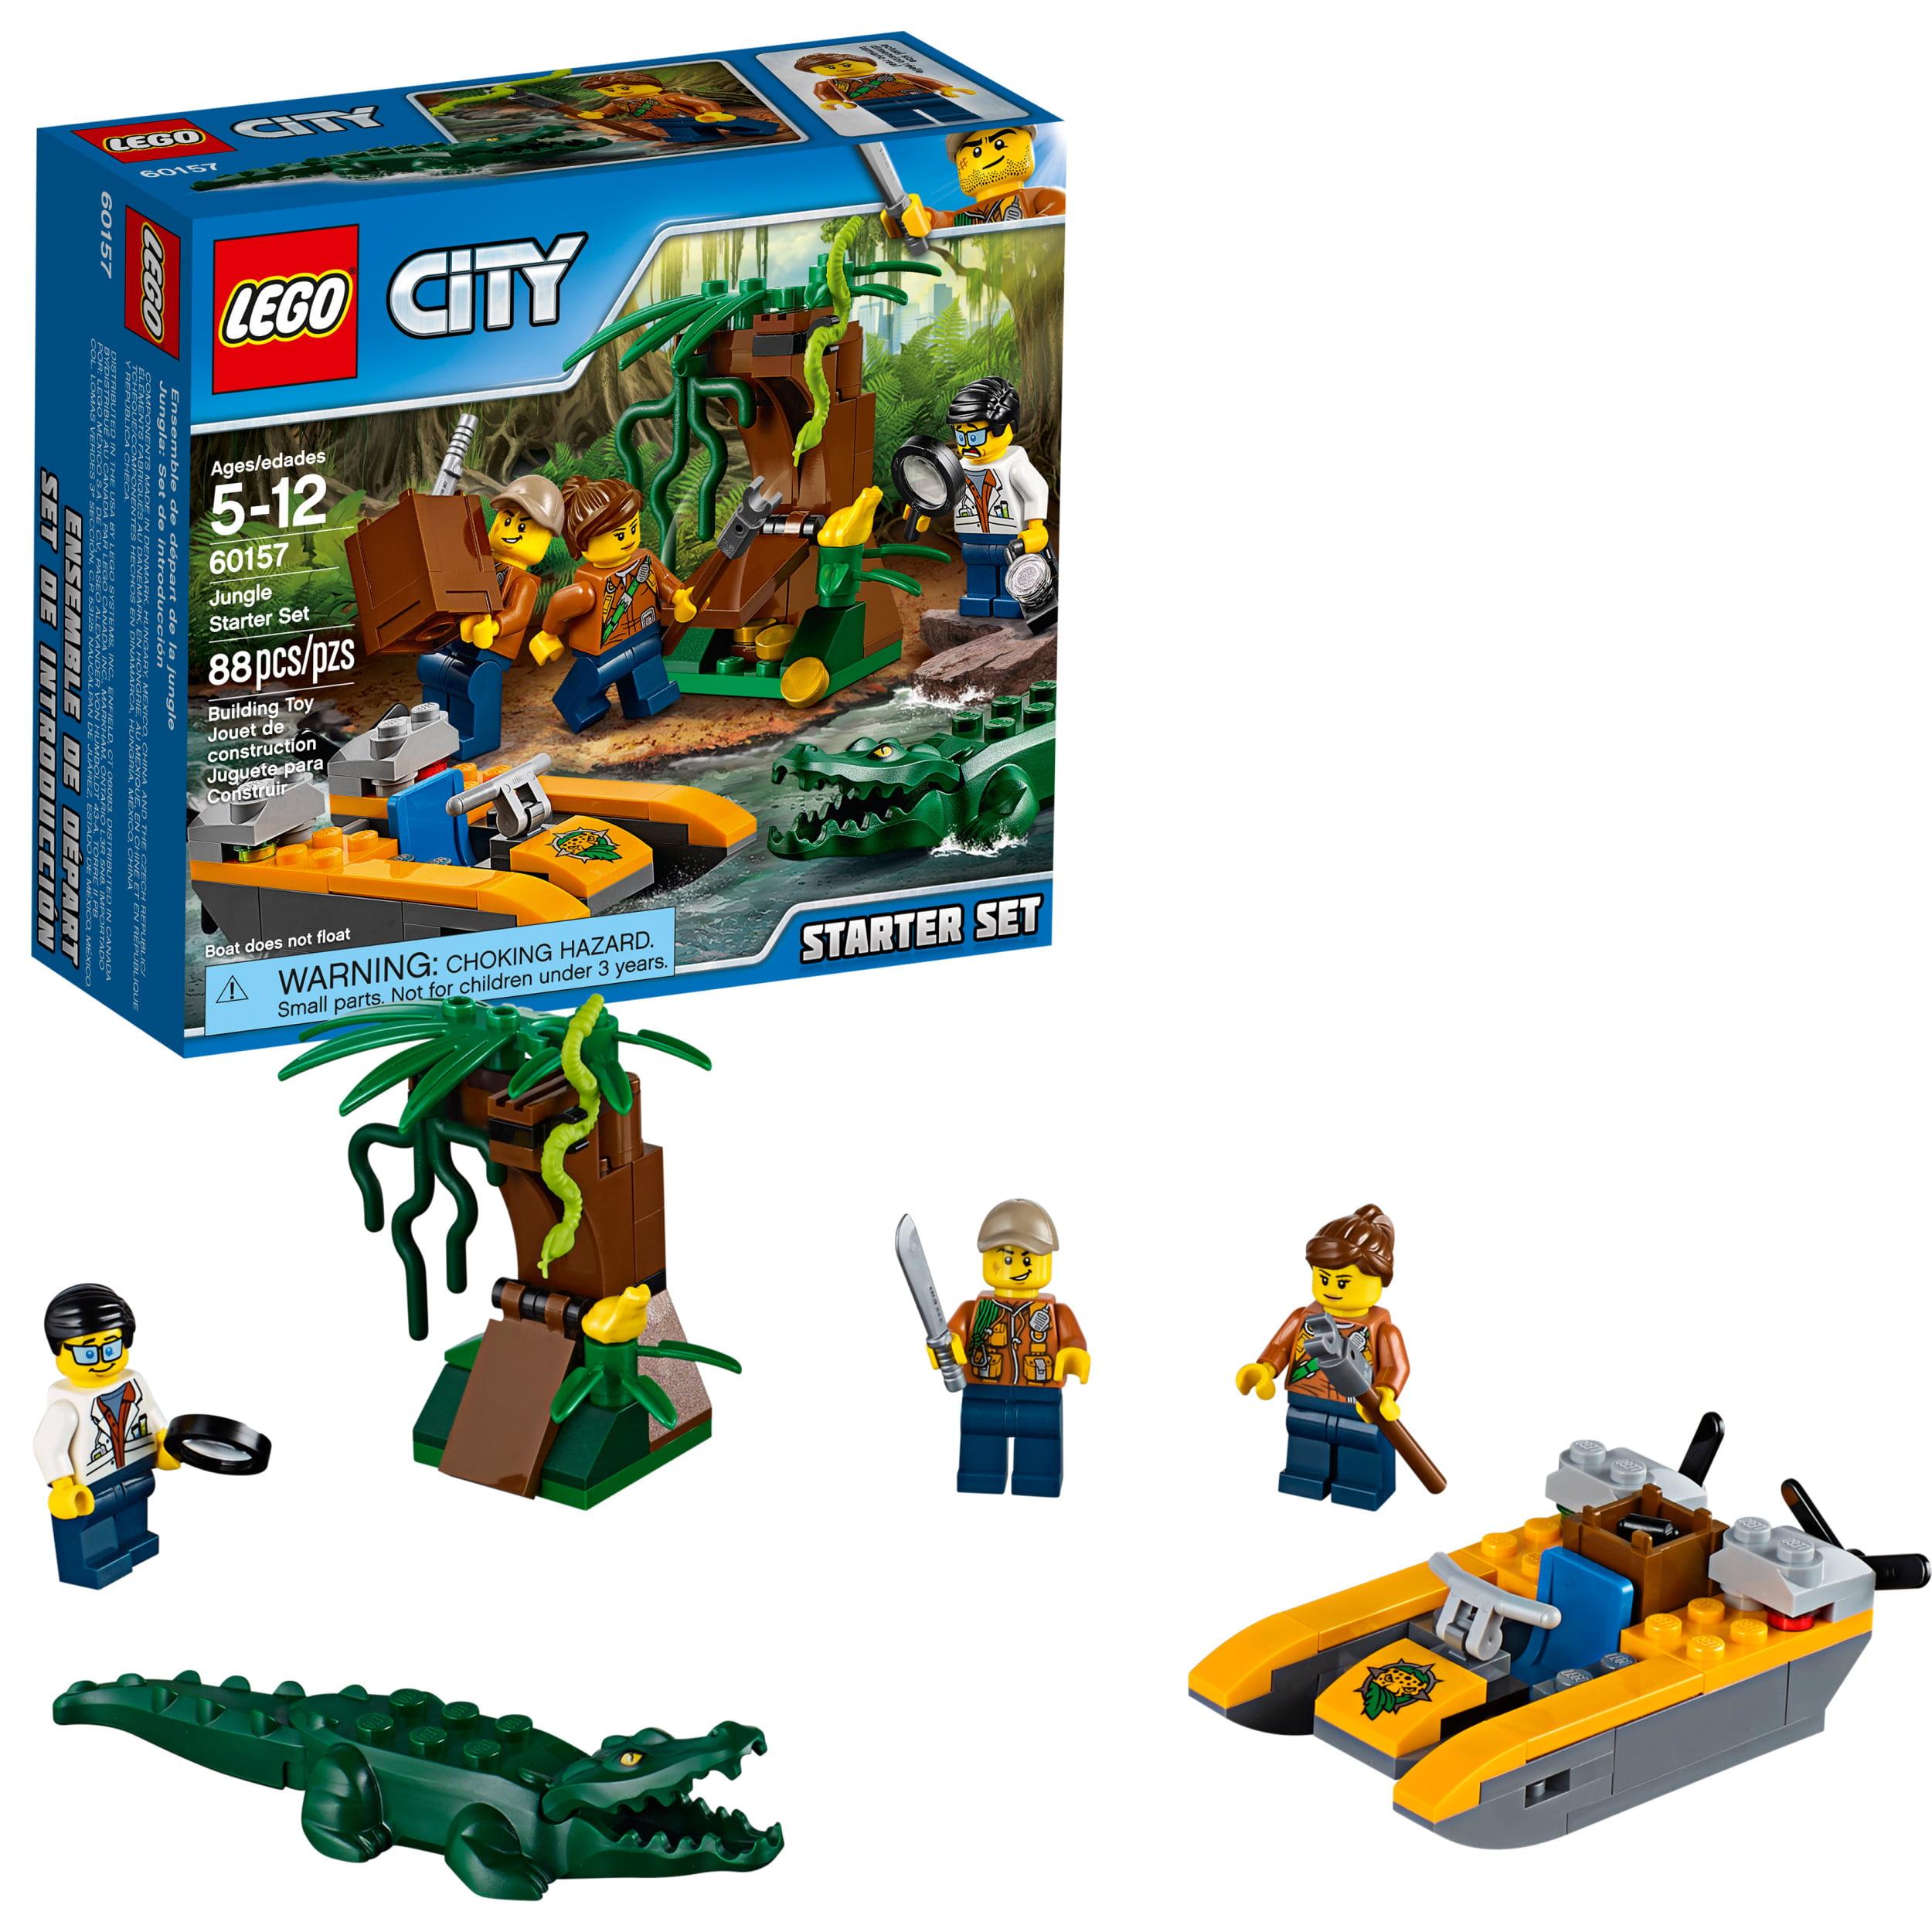 LEGO 60157 City Jungle Starter Set Building Toy #60157